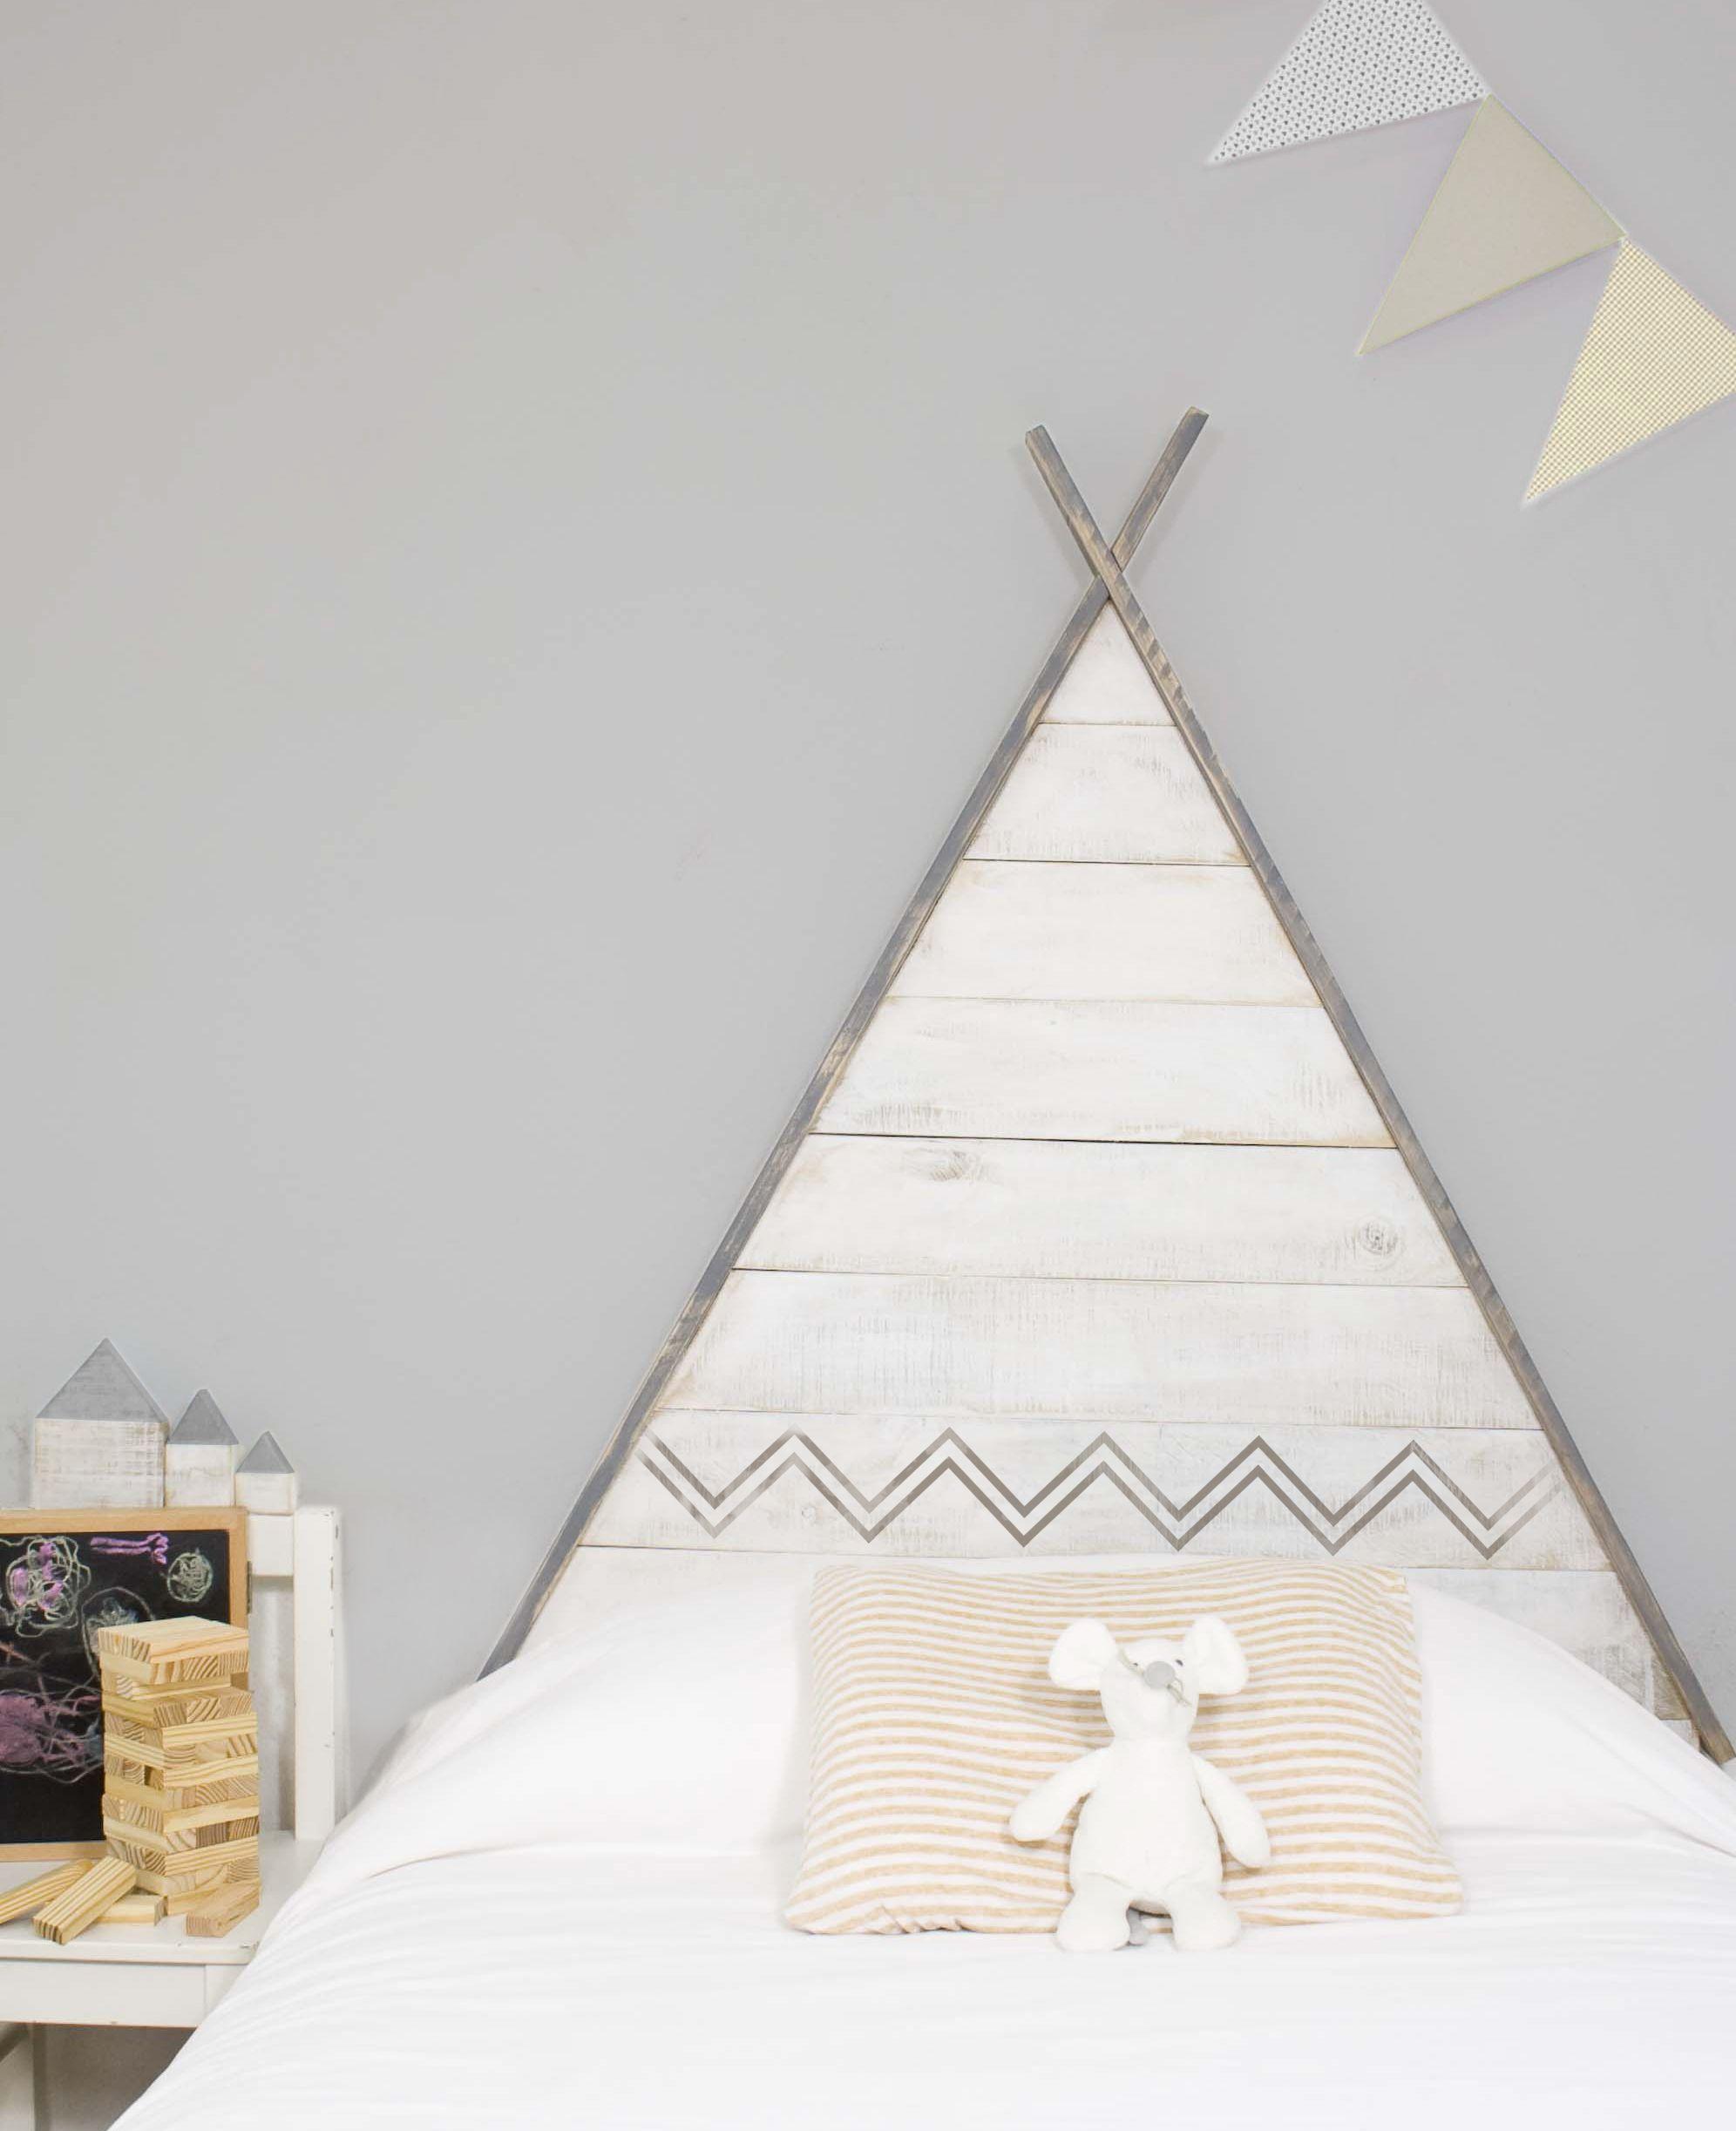 ni/ño pesta/ñitas senefa Pesta/ñas para habitaci/ón de bebe pared dormitorio ni/ña